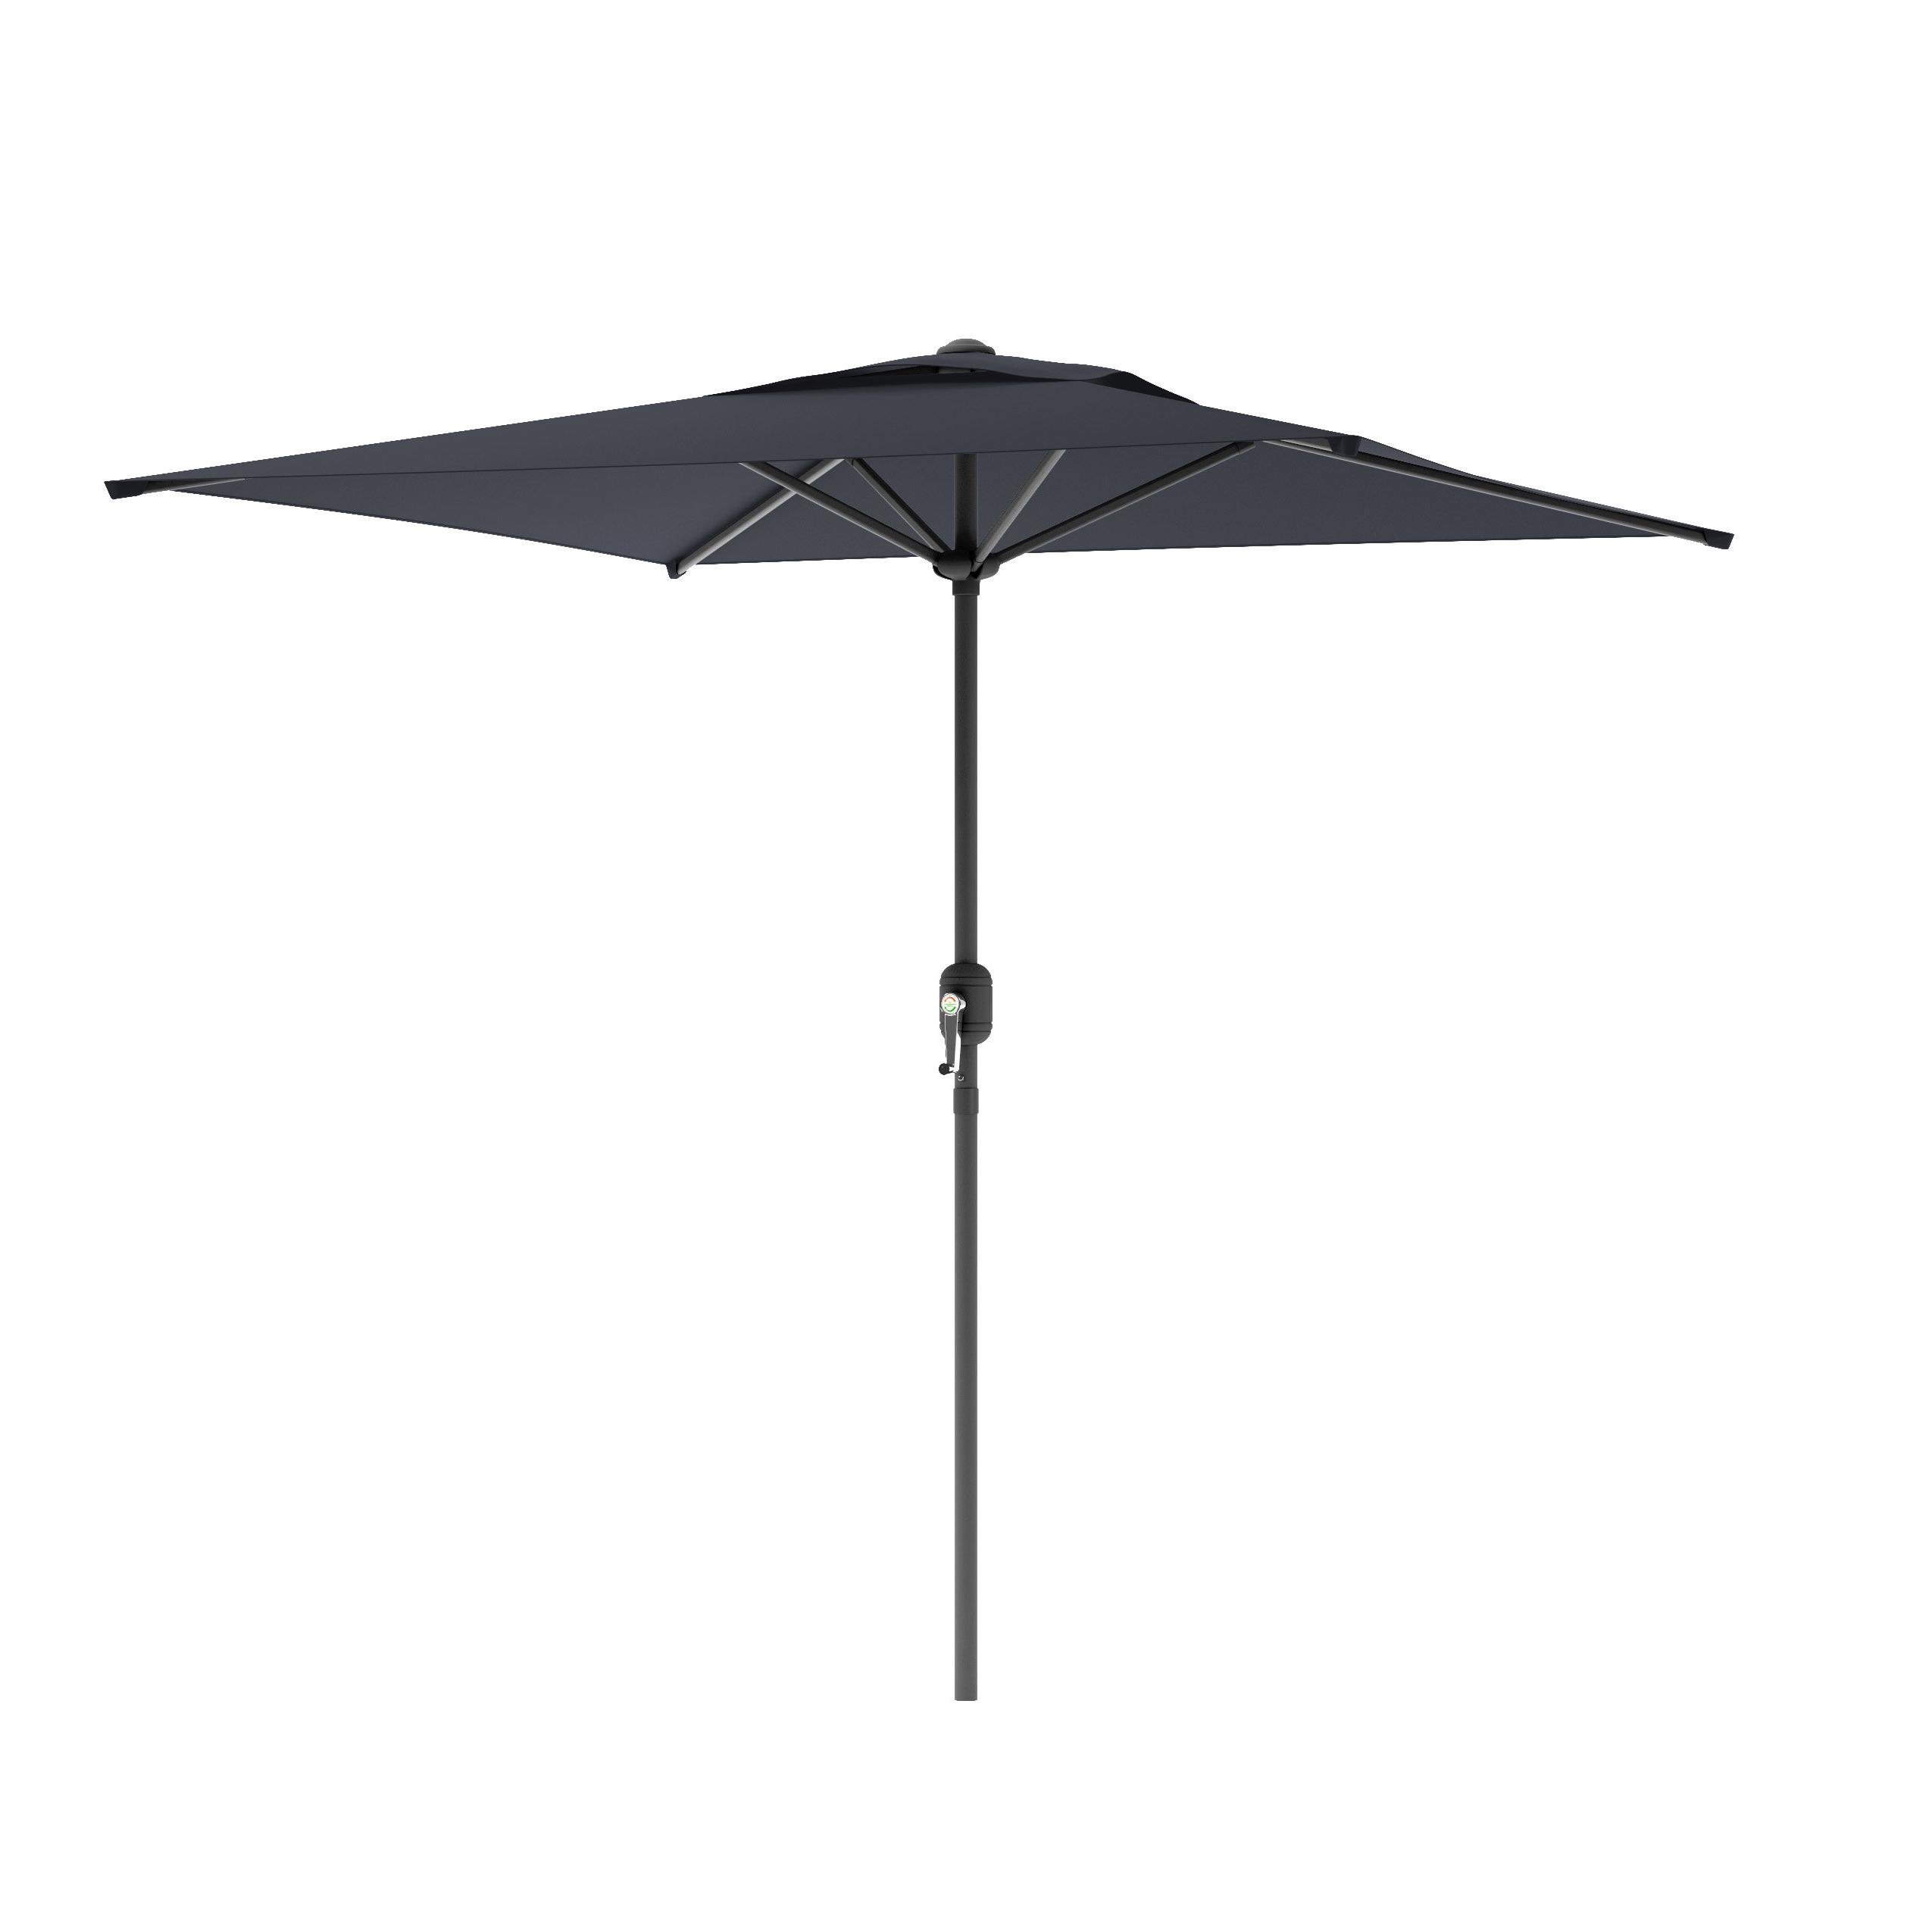 Recent Bradford Patio Market Umbrellas With Regard To Crowborough 9' Square Market Umbrella (View 16 of 20)